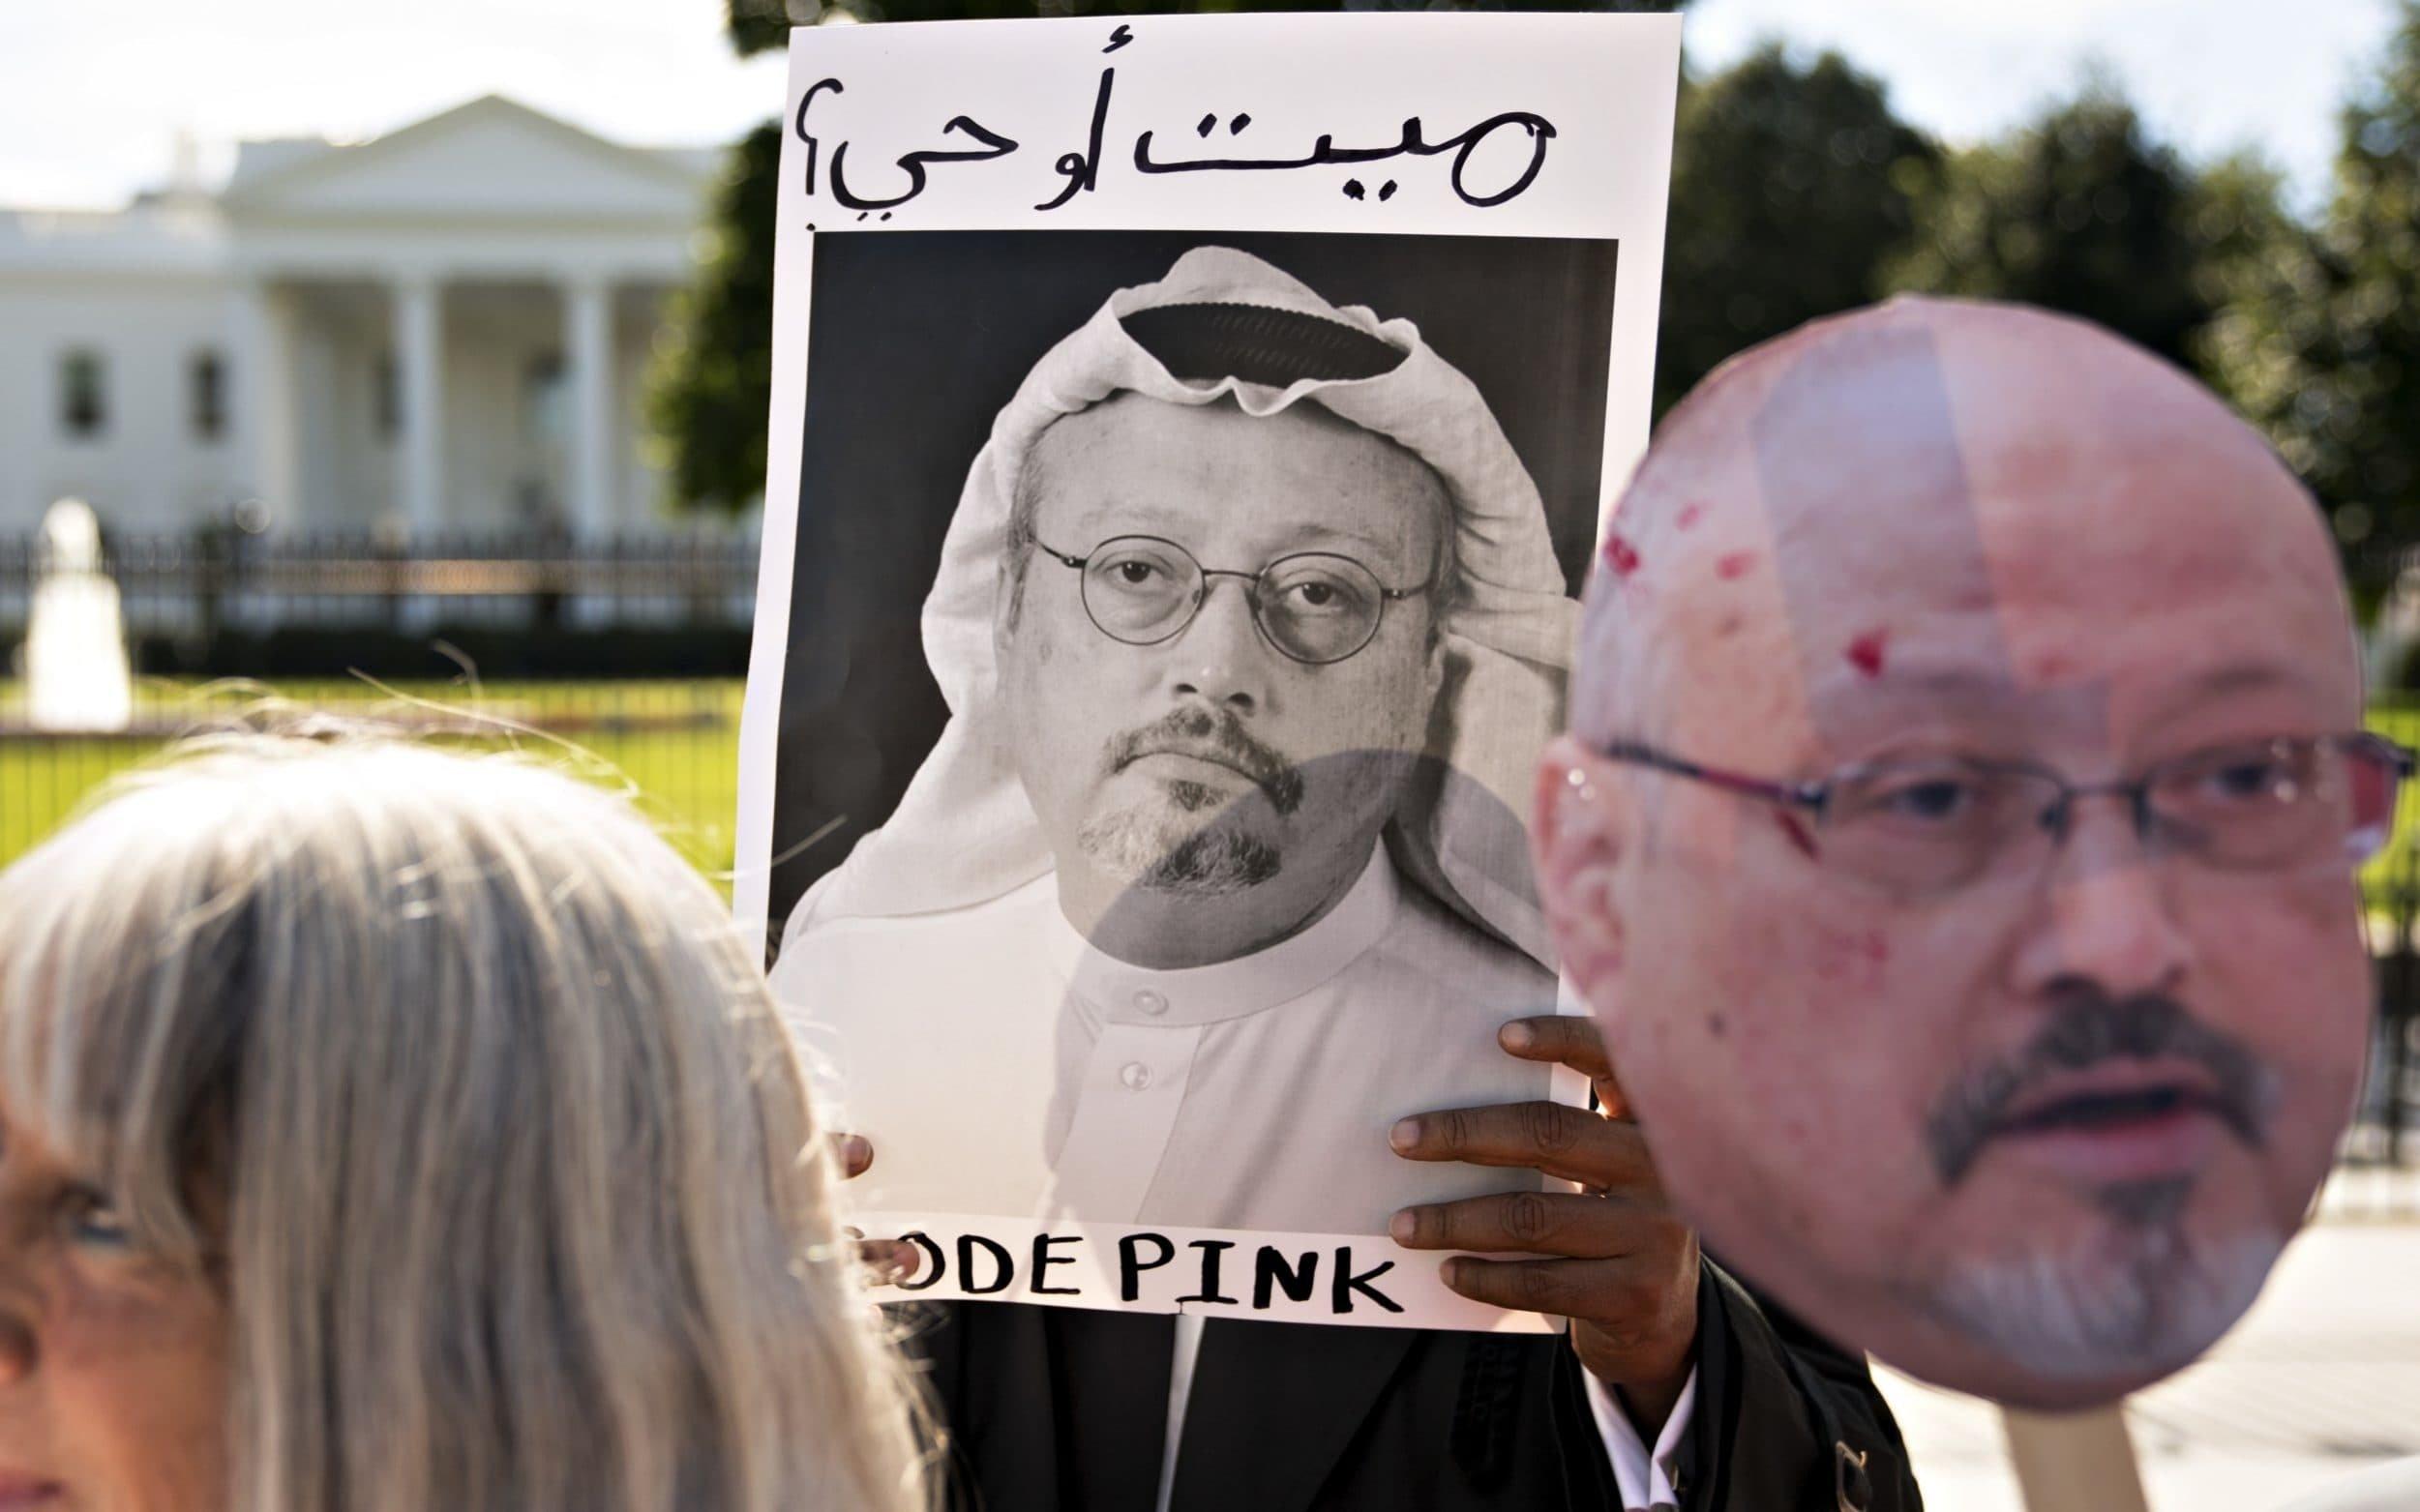 Saudi Arabia Is Wrapping Up Its Jamal Khashoggi Investigation, But More Credible Alternatives Remain